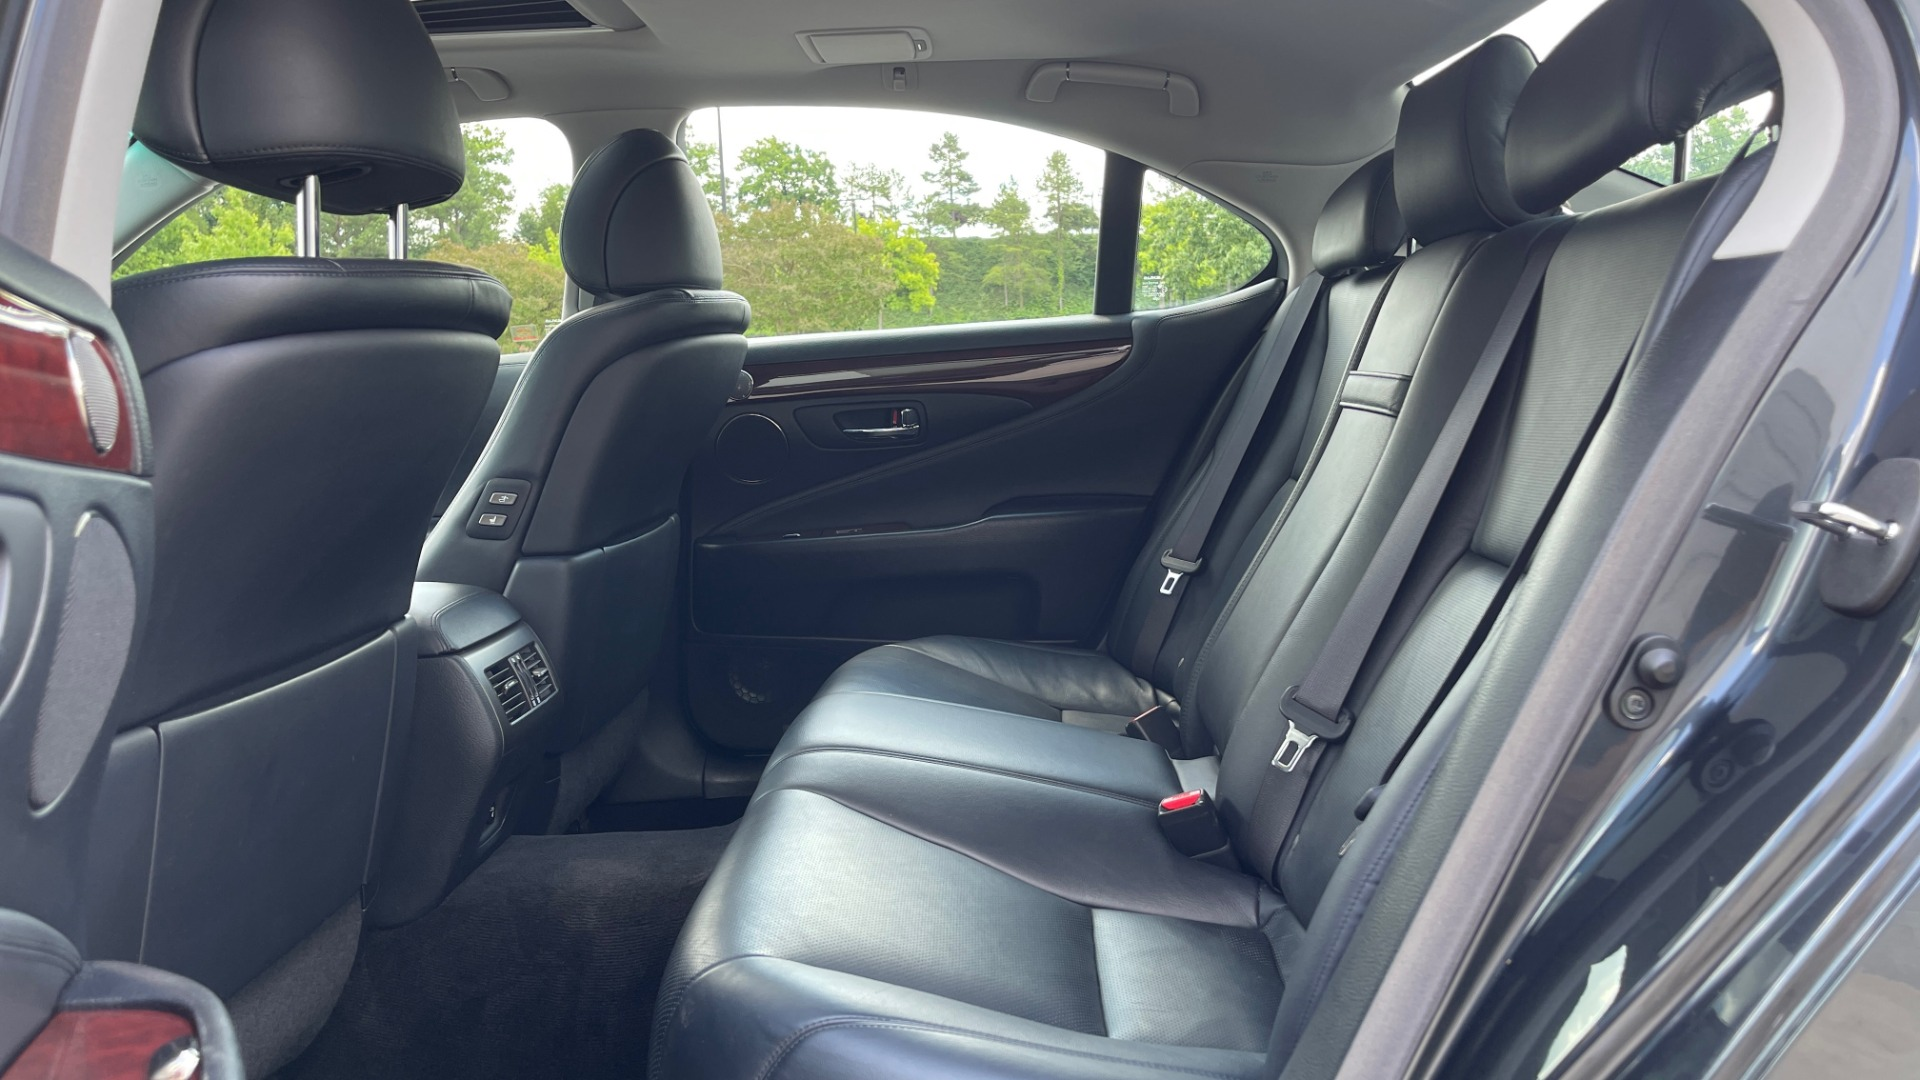 Used 2007 Lexus LS 460 SEDAN / COMFORT PKG / NAVIGATION / MARK LEVINSON / REARVIEW for sale $14,995 at Formula Imports in Charlotte NC 28227 54